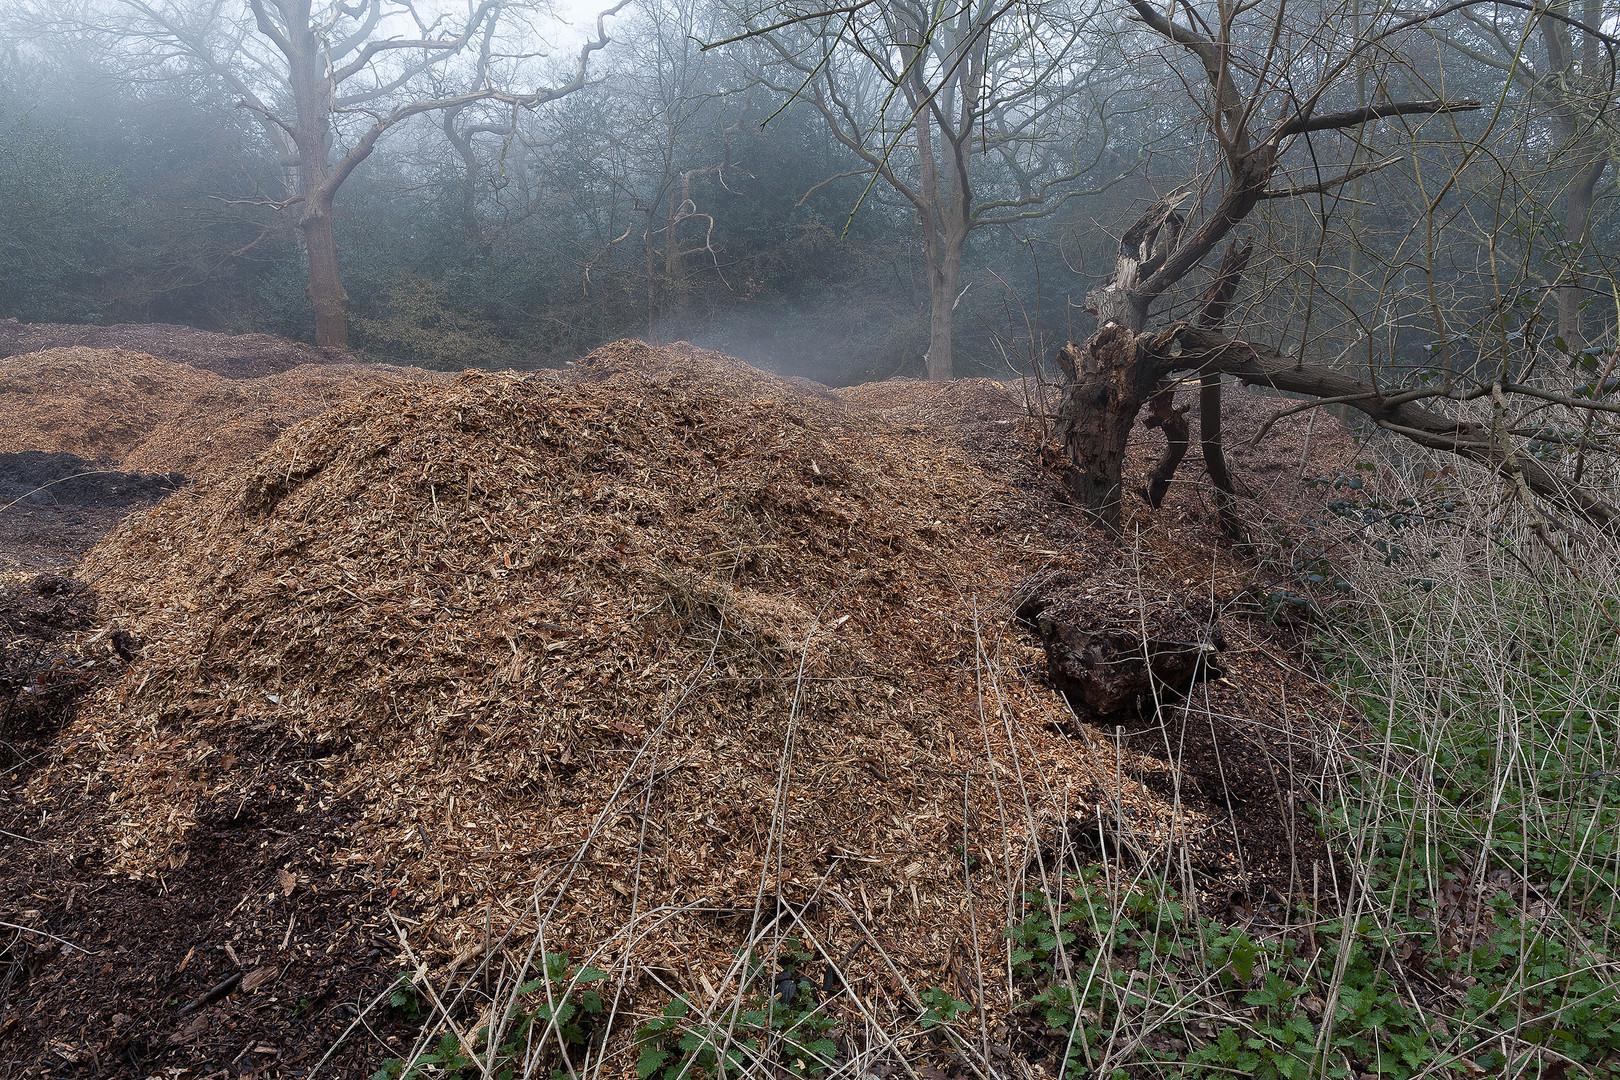 Steaming hot sawdust, Wimbledon Common, London, England, UK